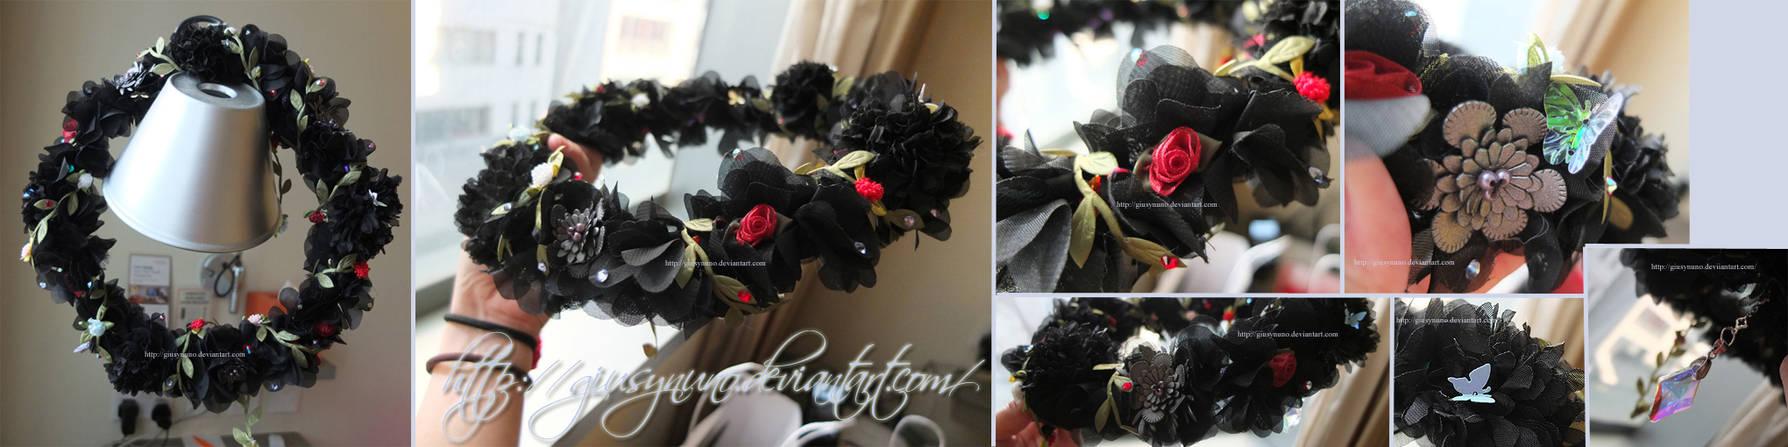 Hades' bride original flower crown